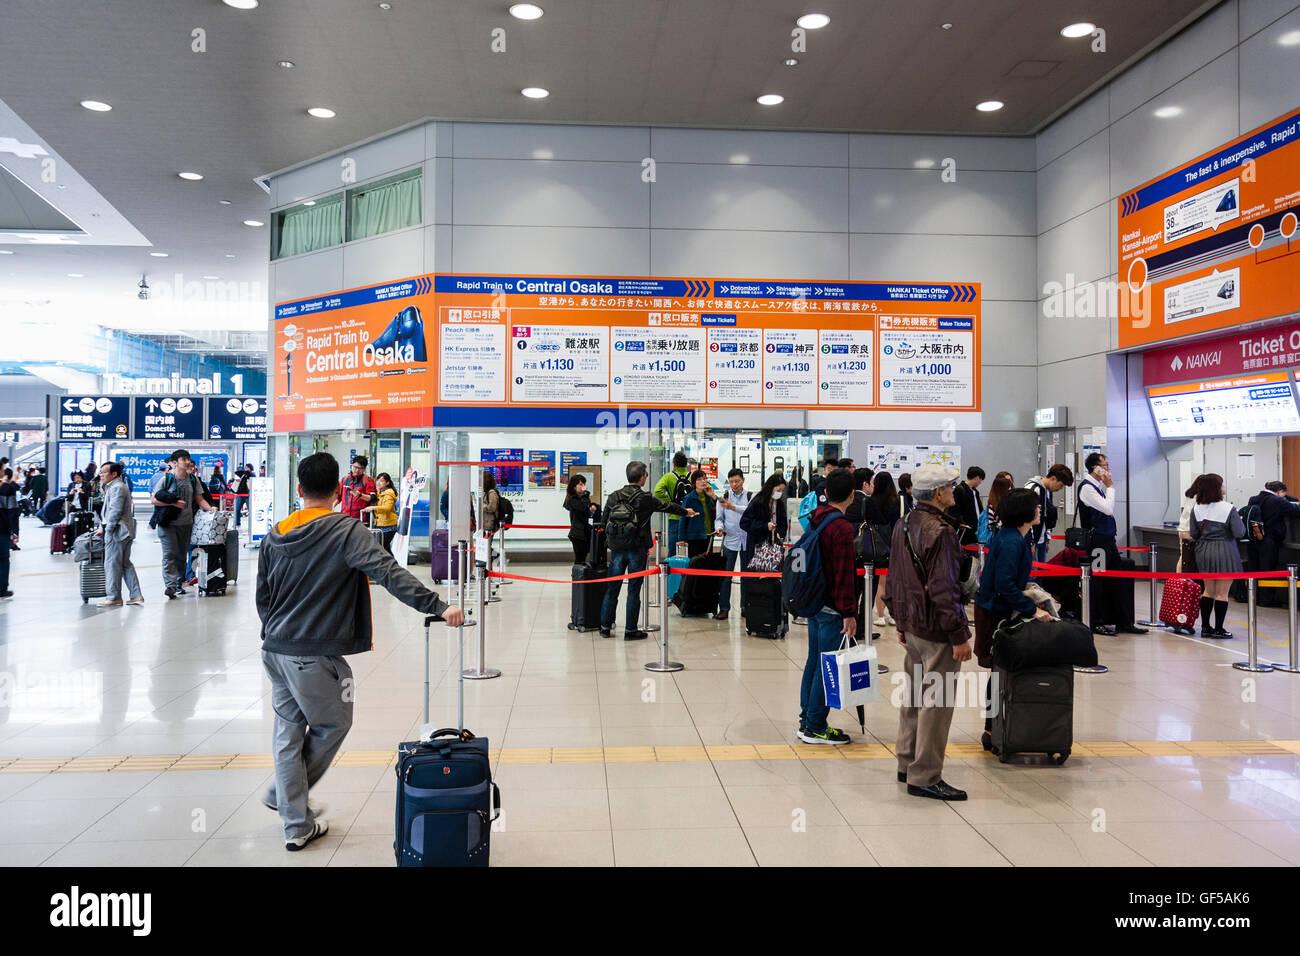 Japan, Kansai airport, KIX. Interior Aeroplaze transport hub. Nankai railways ticket area with passengers, some - Stock Image